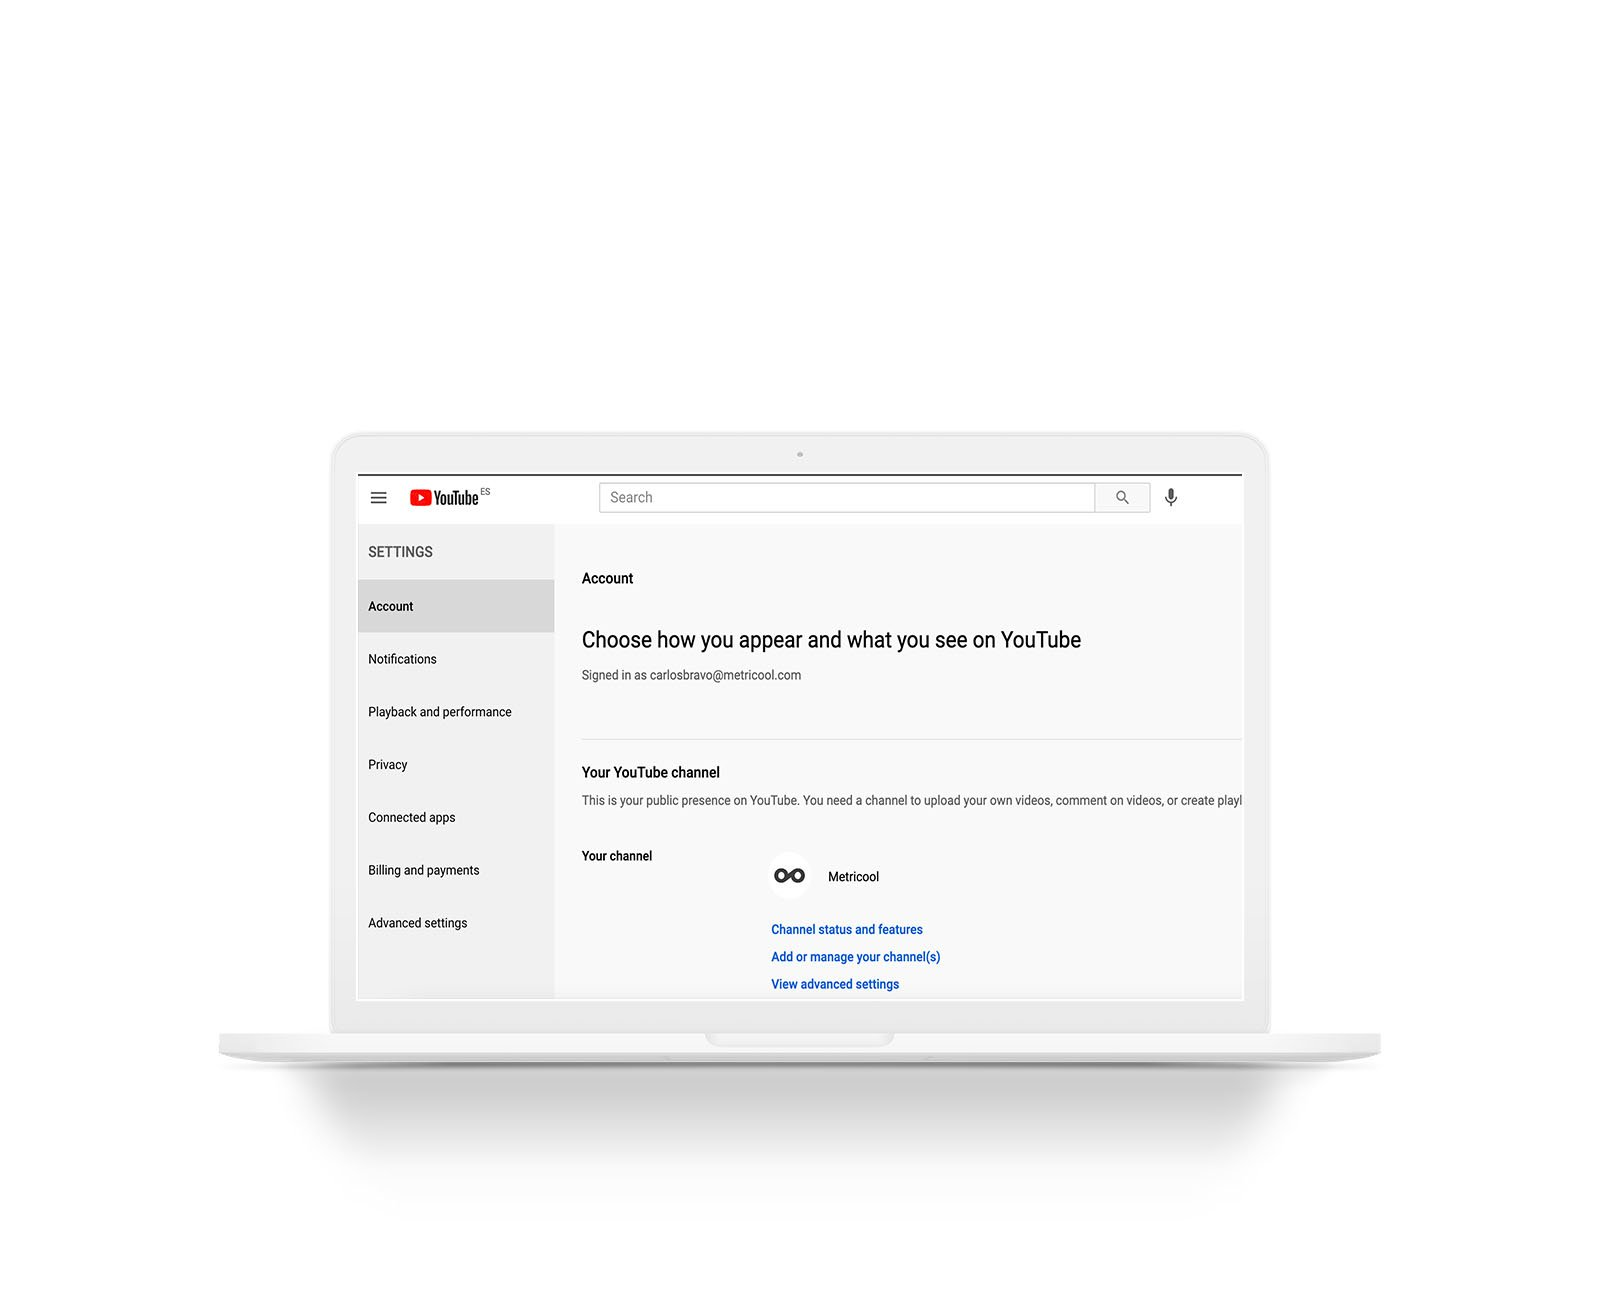 añadir administrador al canal de YouTube